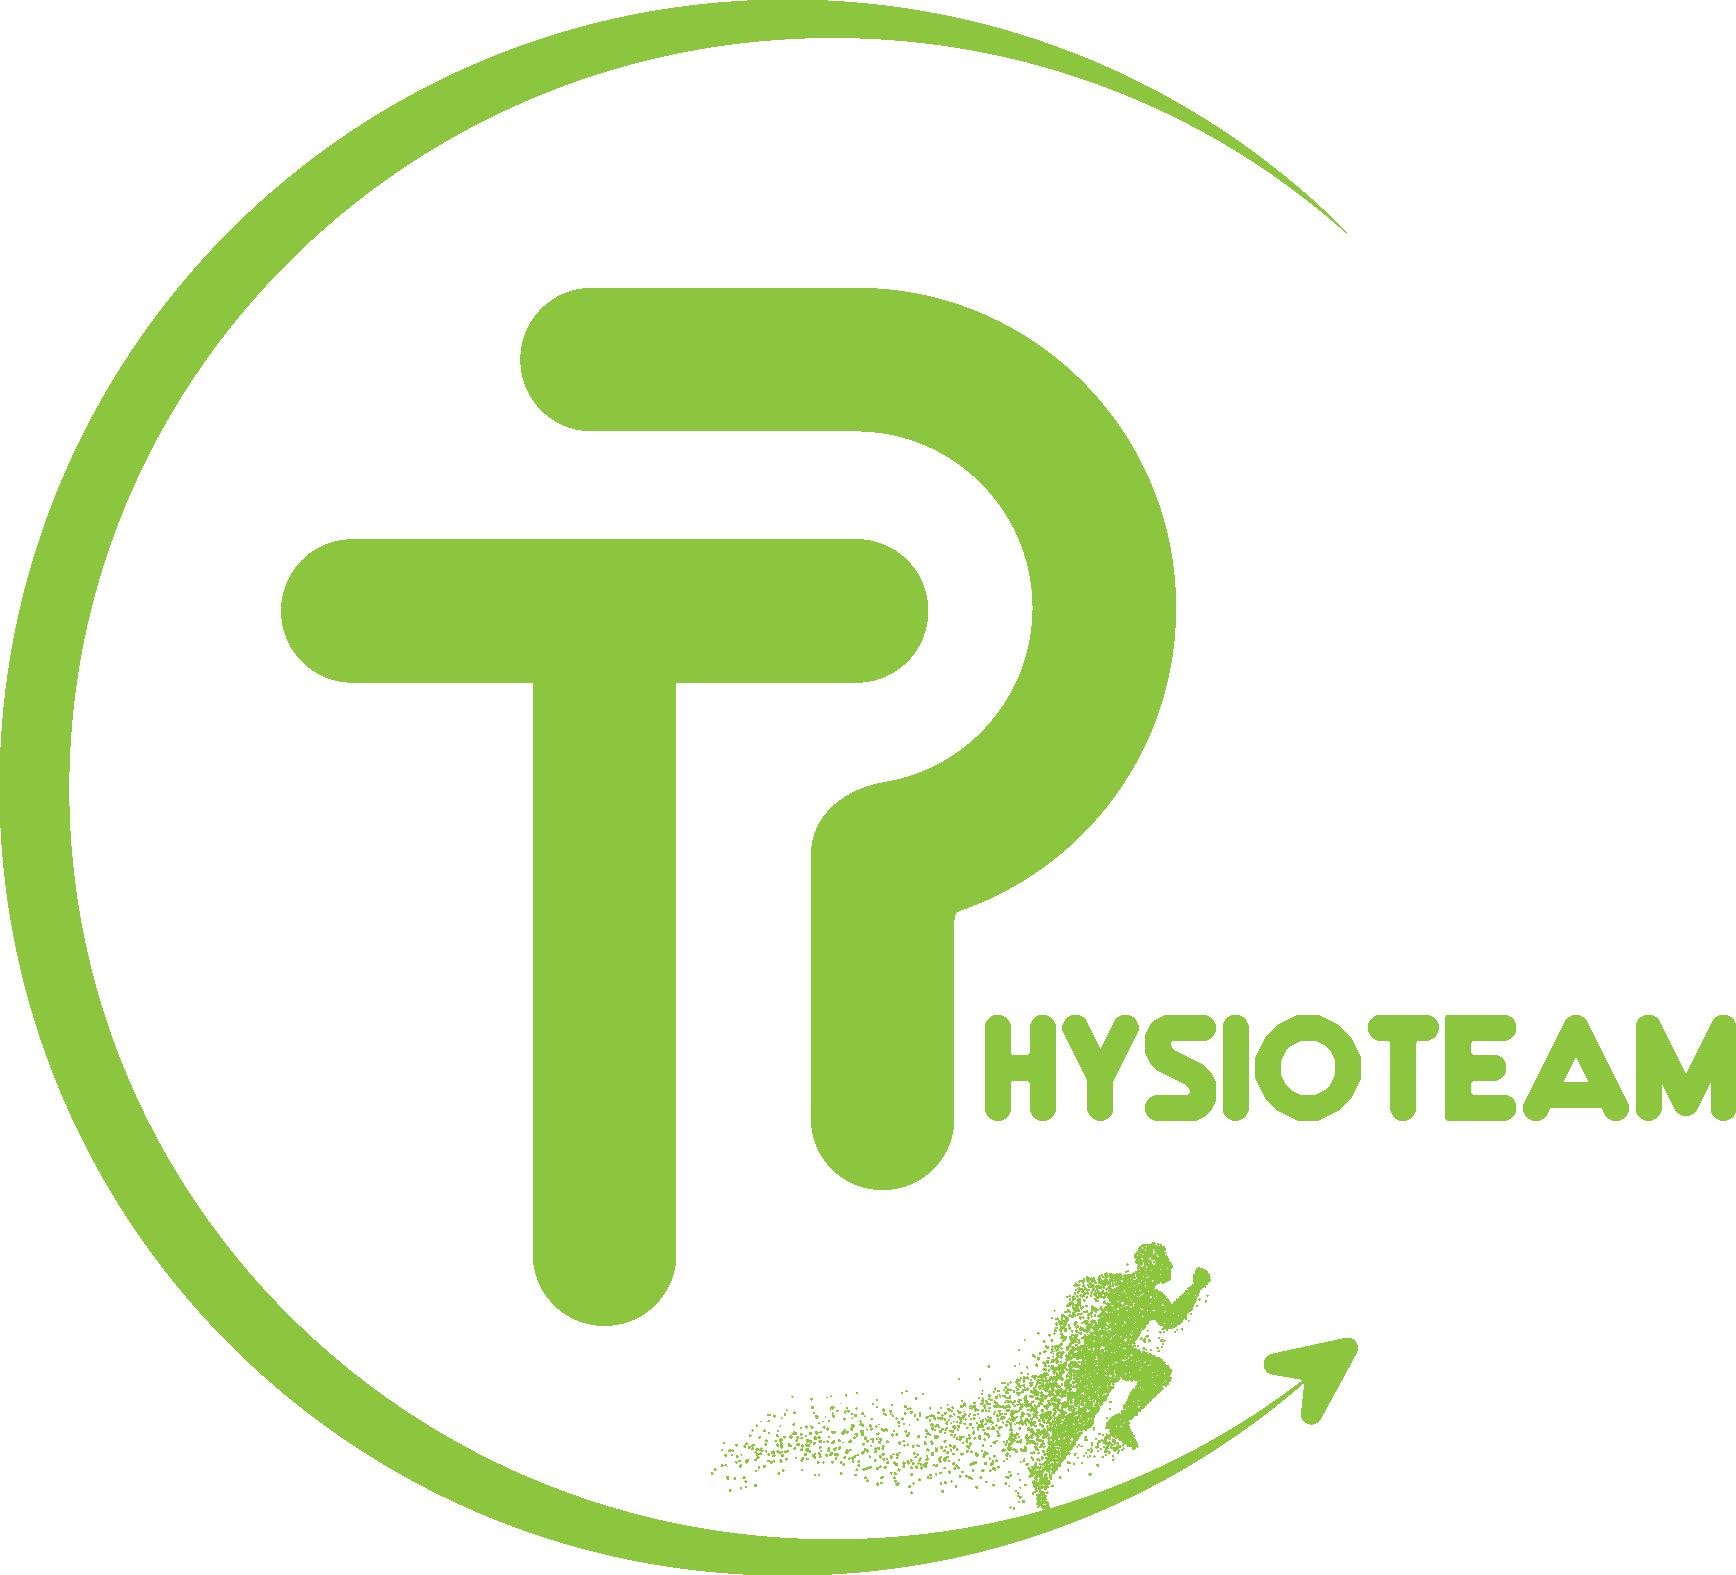 Physioteam